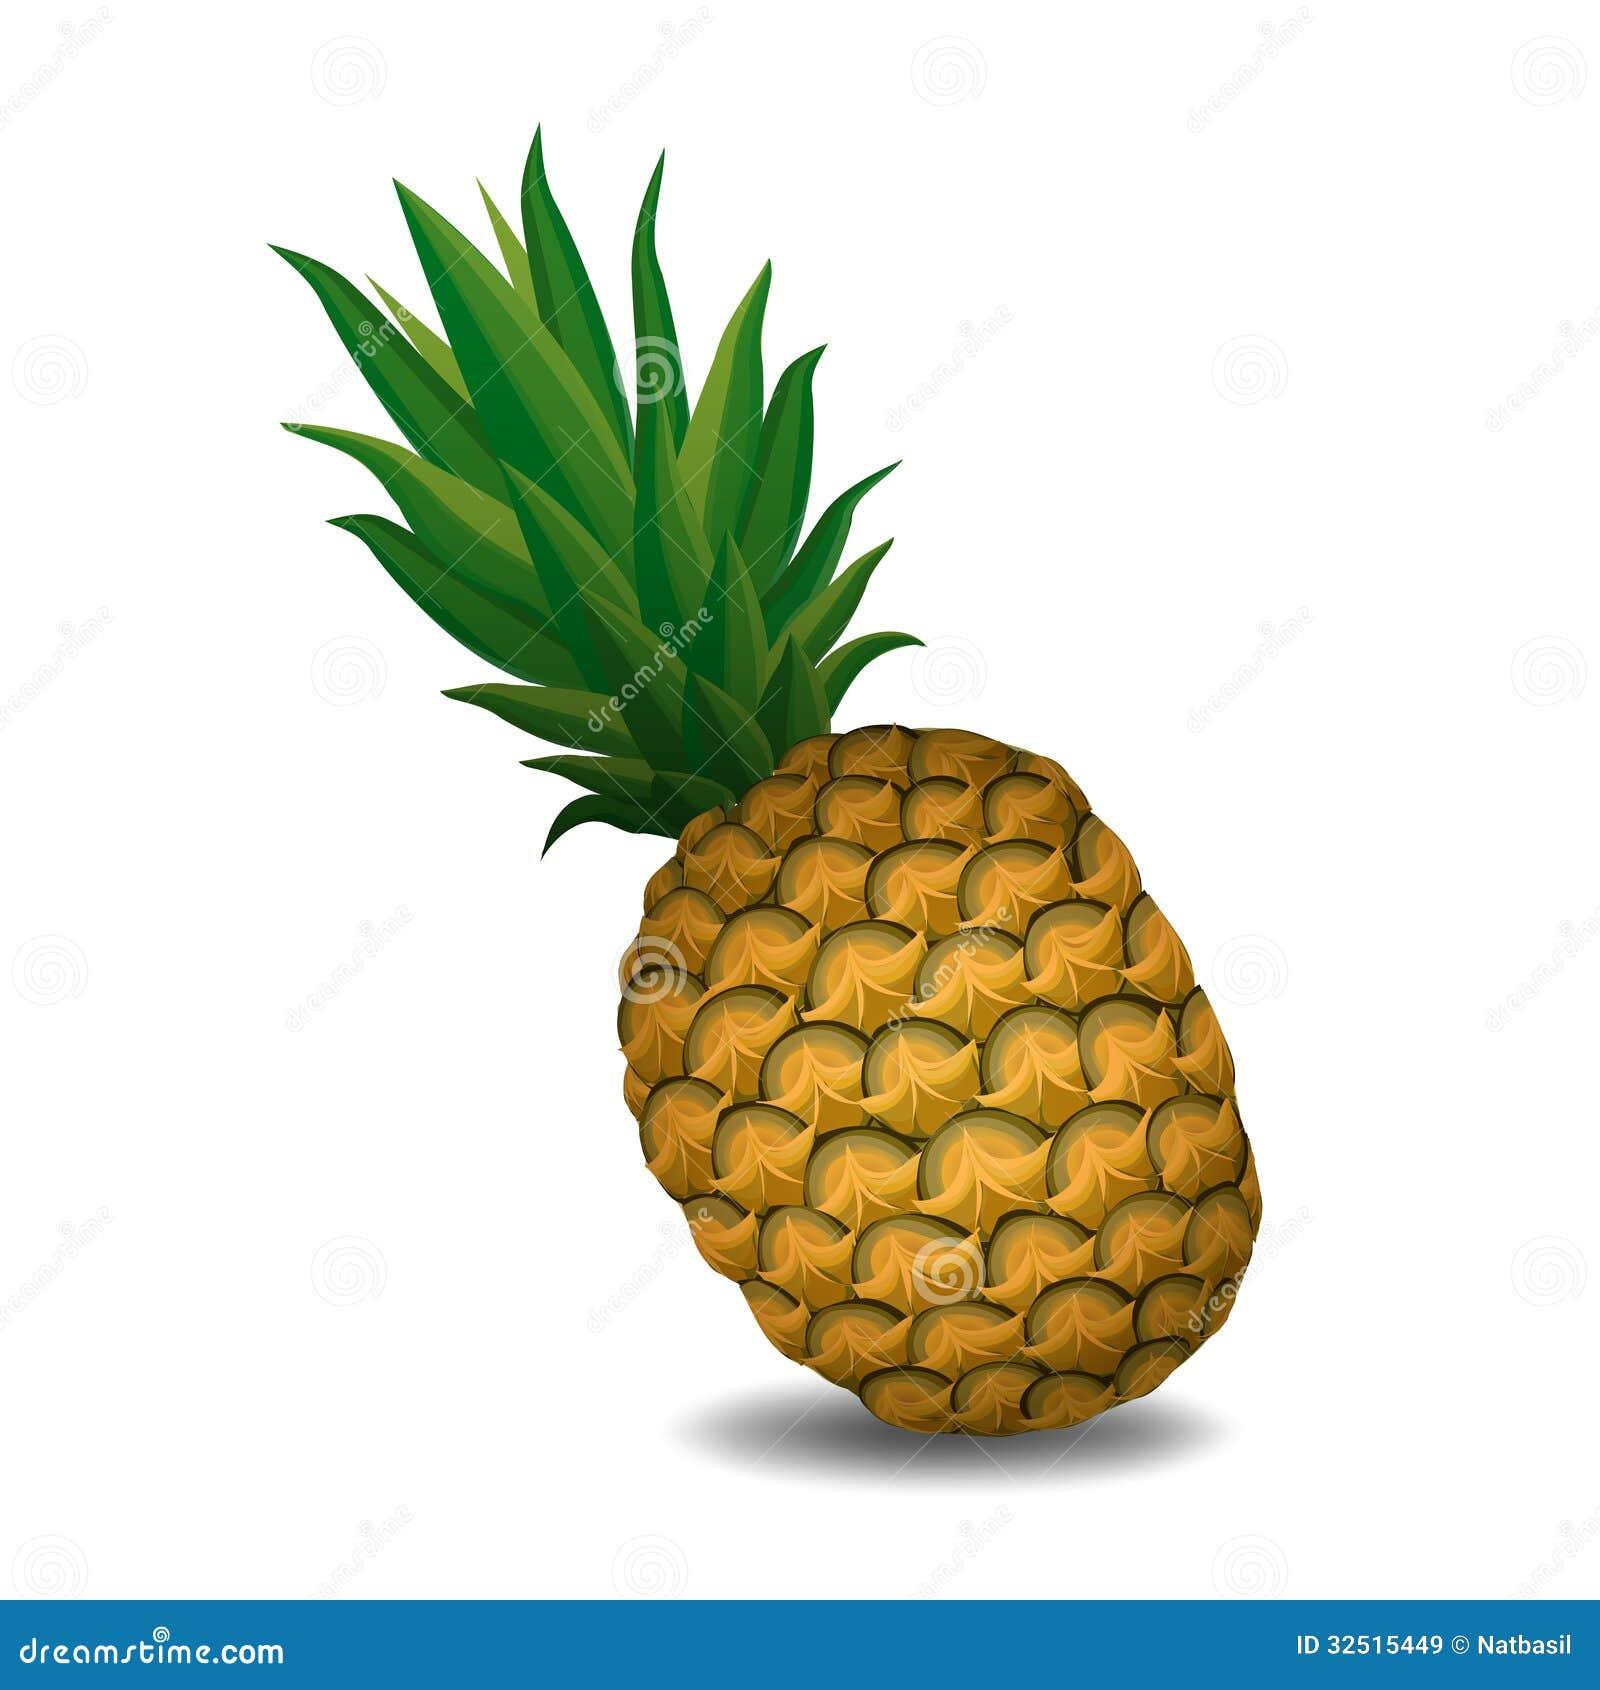 Pineapple Pineapple On White Background Stock Vector ...